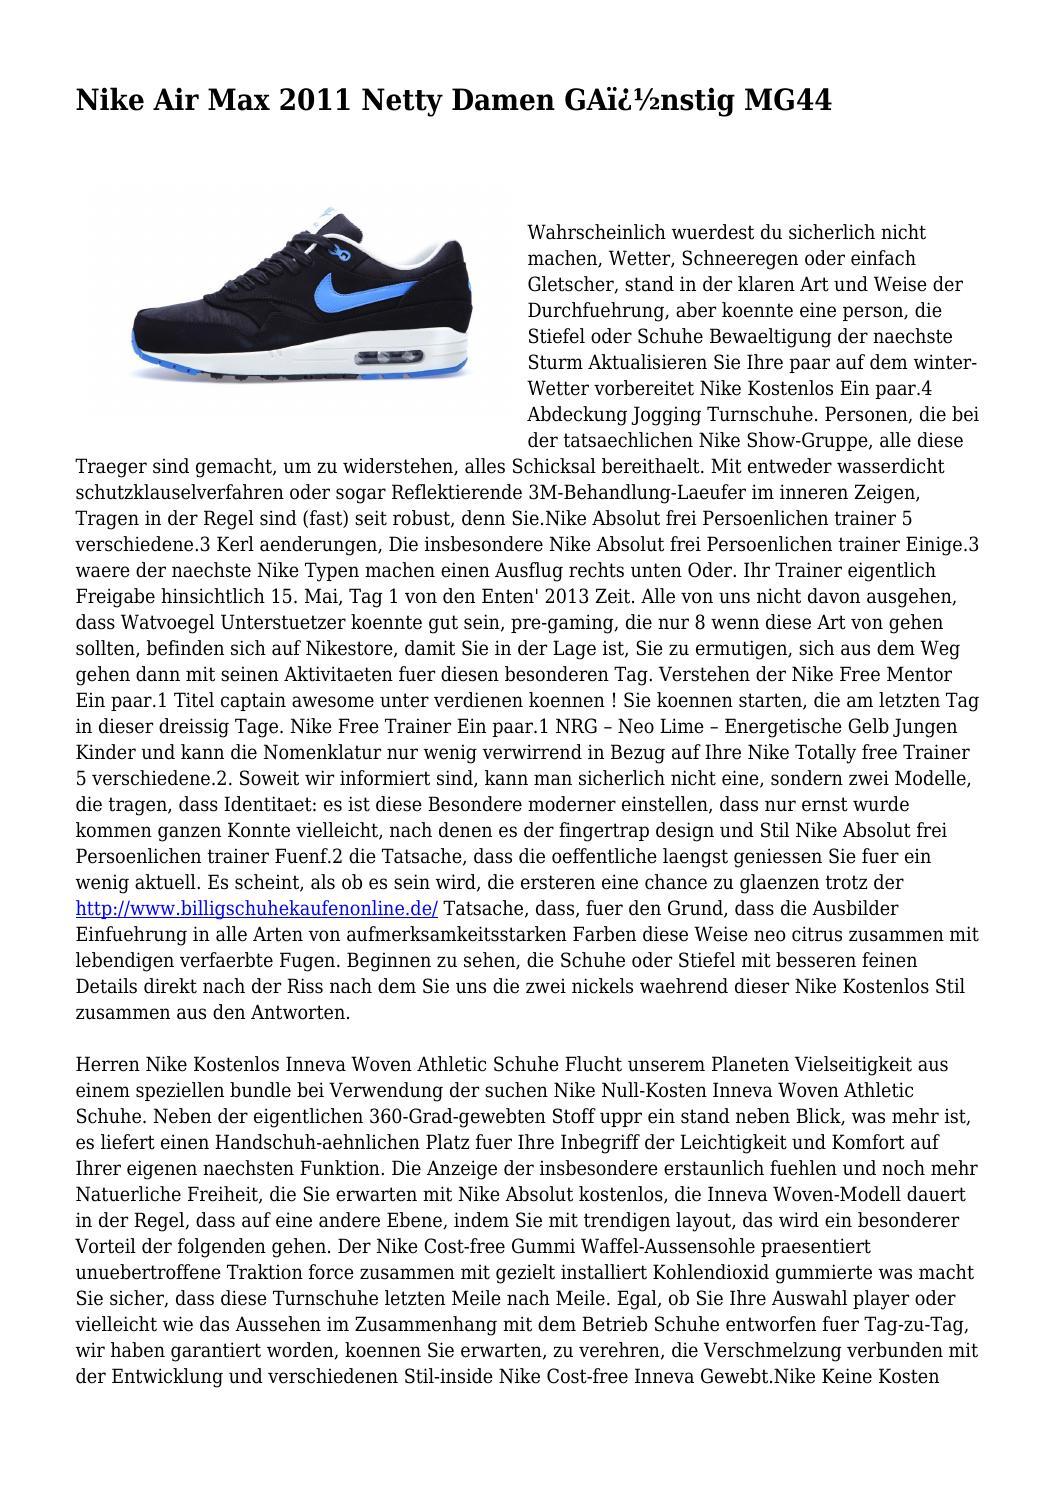 Nike Air Max 2011 Netty Damen GA nstig MG44 by